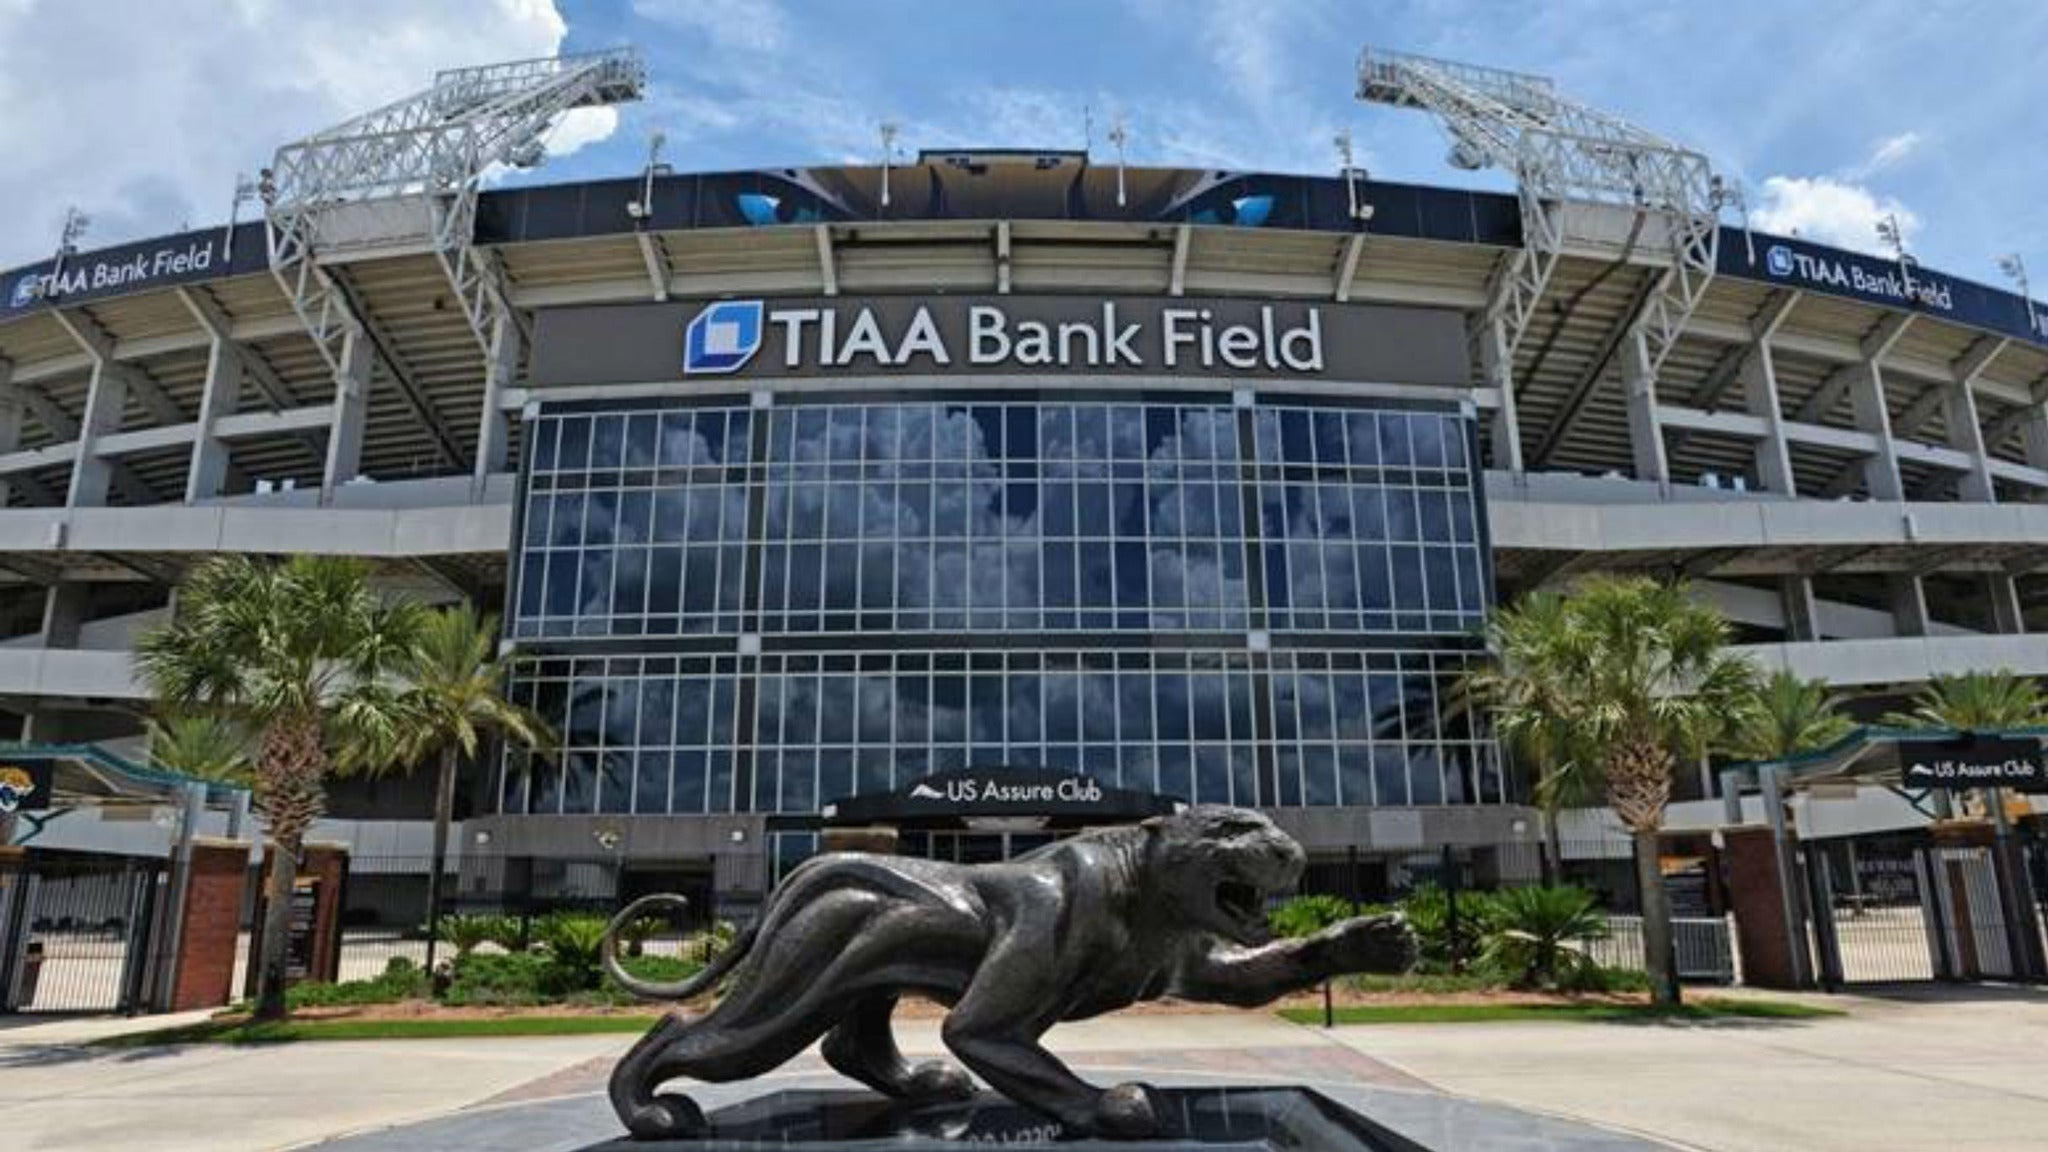 TIAA Bank Field Guided Stadium Tours